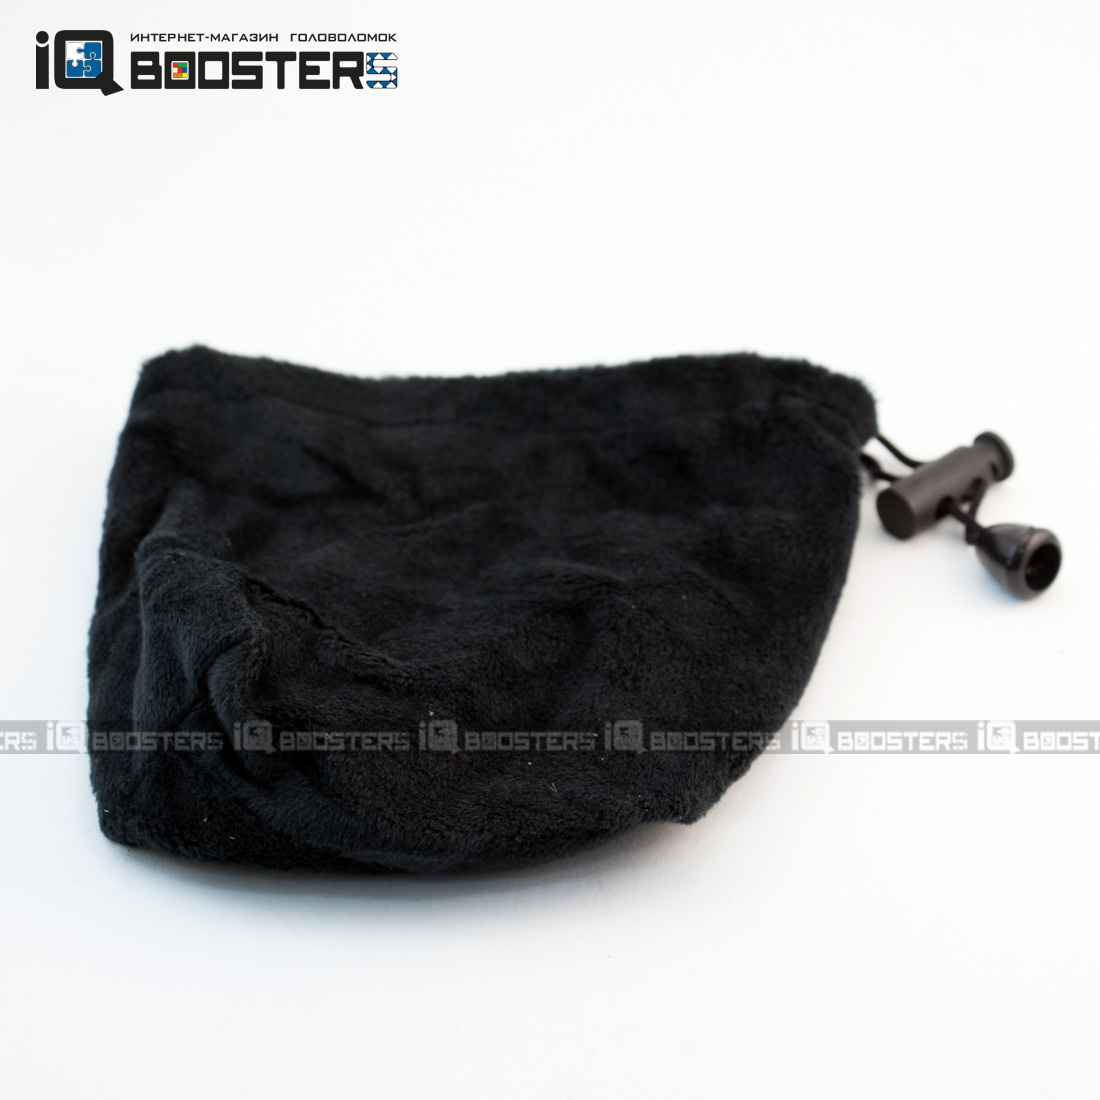 soft_bag_b1